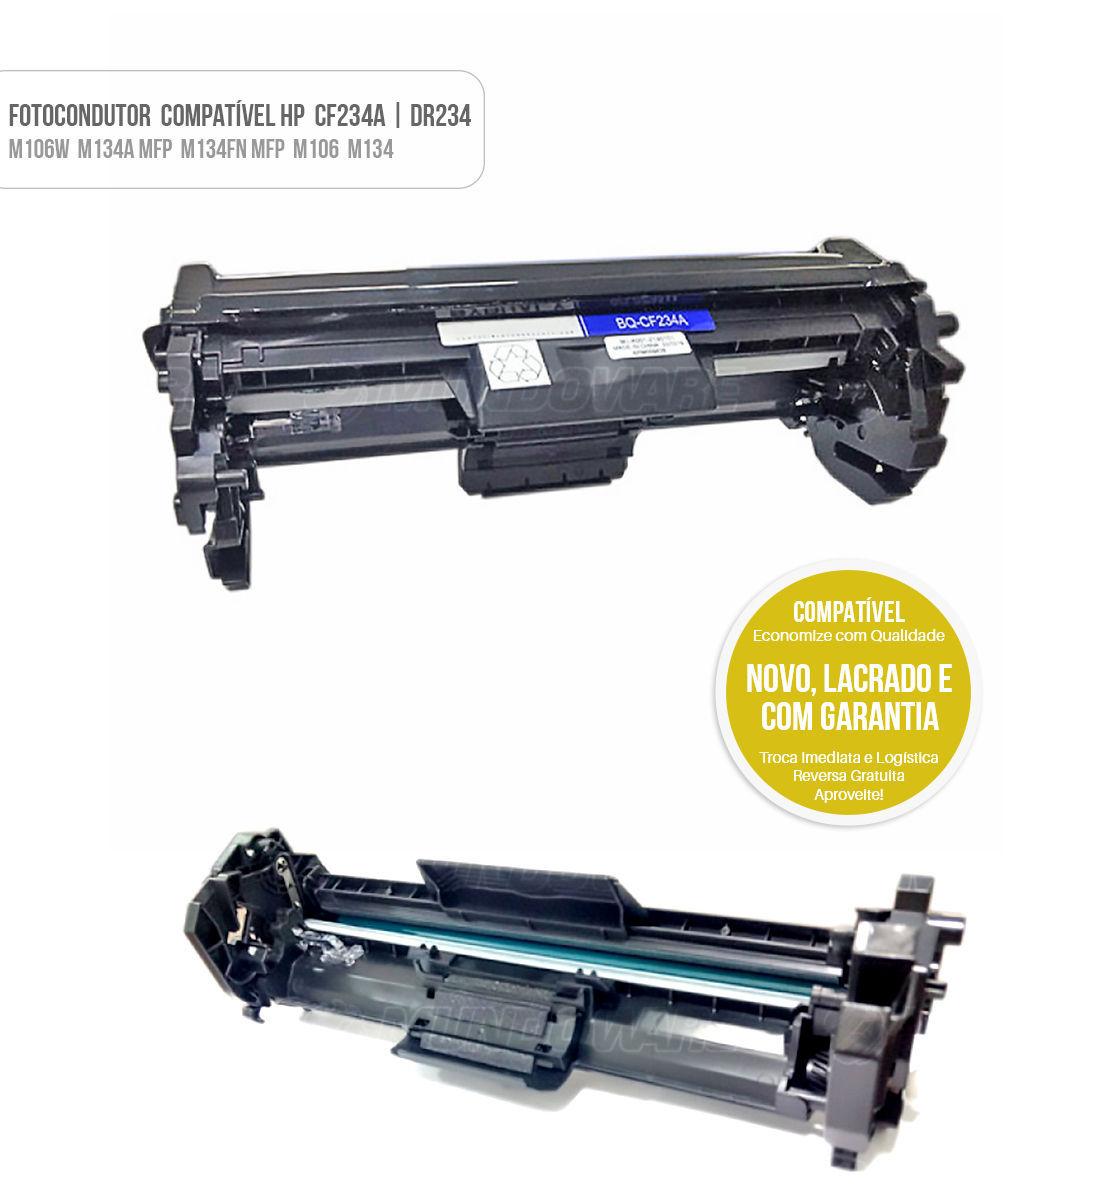 Cartucho de Cilindro Fotocondutor Compatível CF234 DR234A para impressora HP M106W M134A MFP M134FN MFP M106 M134